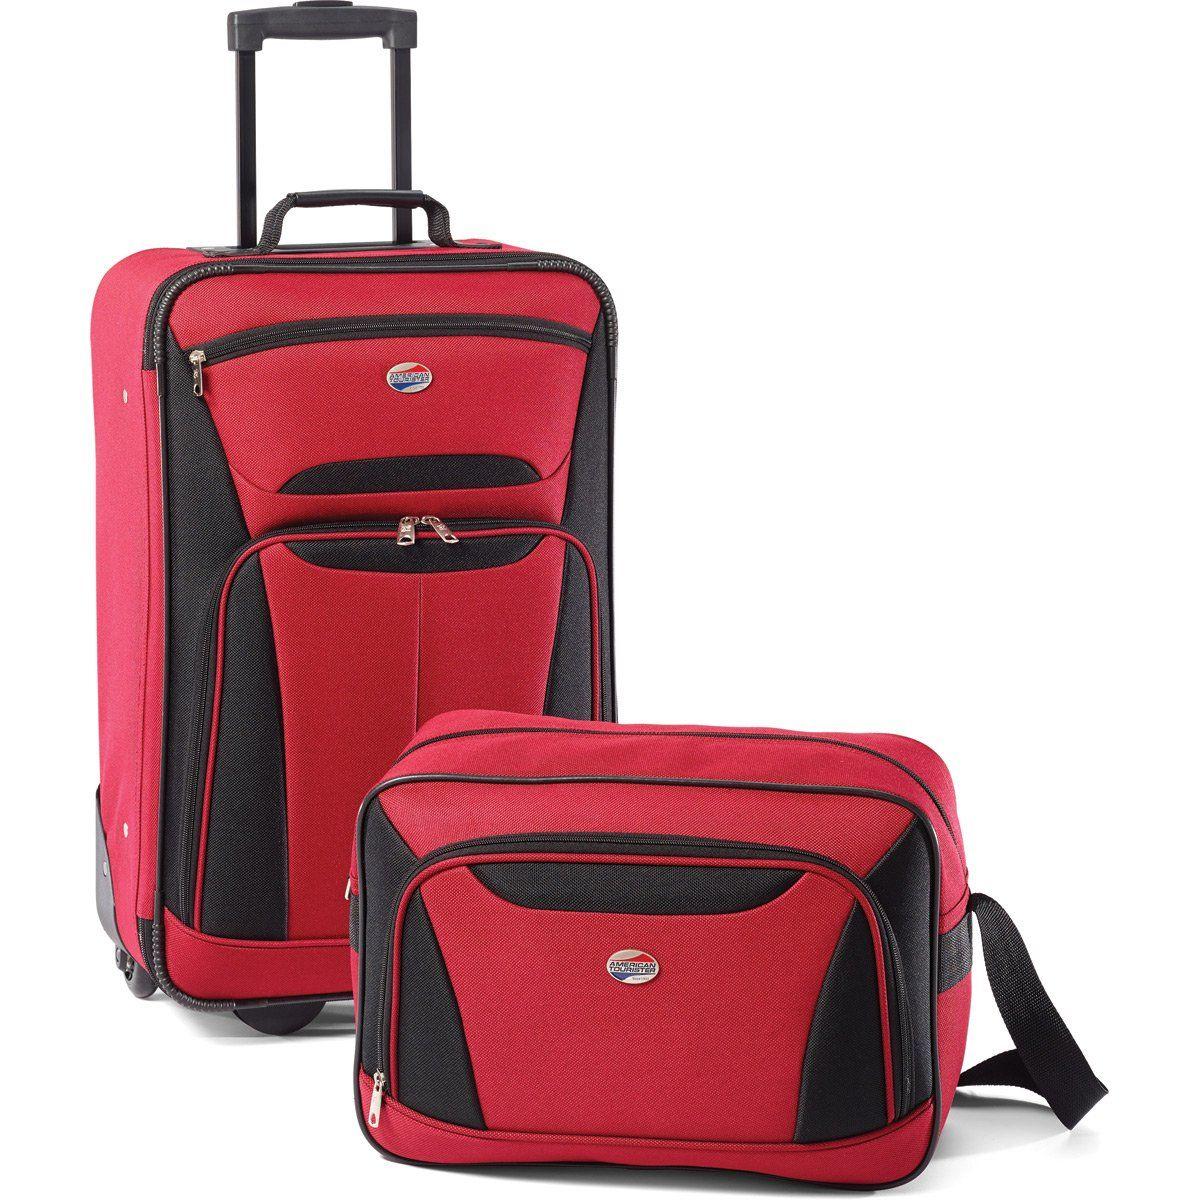 1b8da9fc6 American Tourister Fieldbrook Ii 2 Piece Luggage Set in 2019 ...